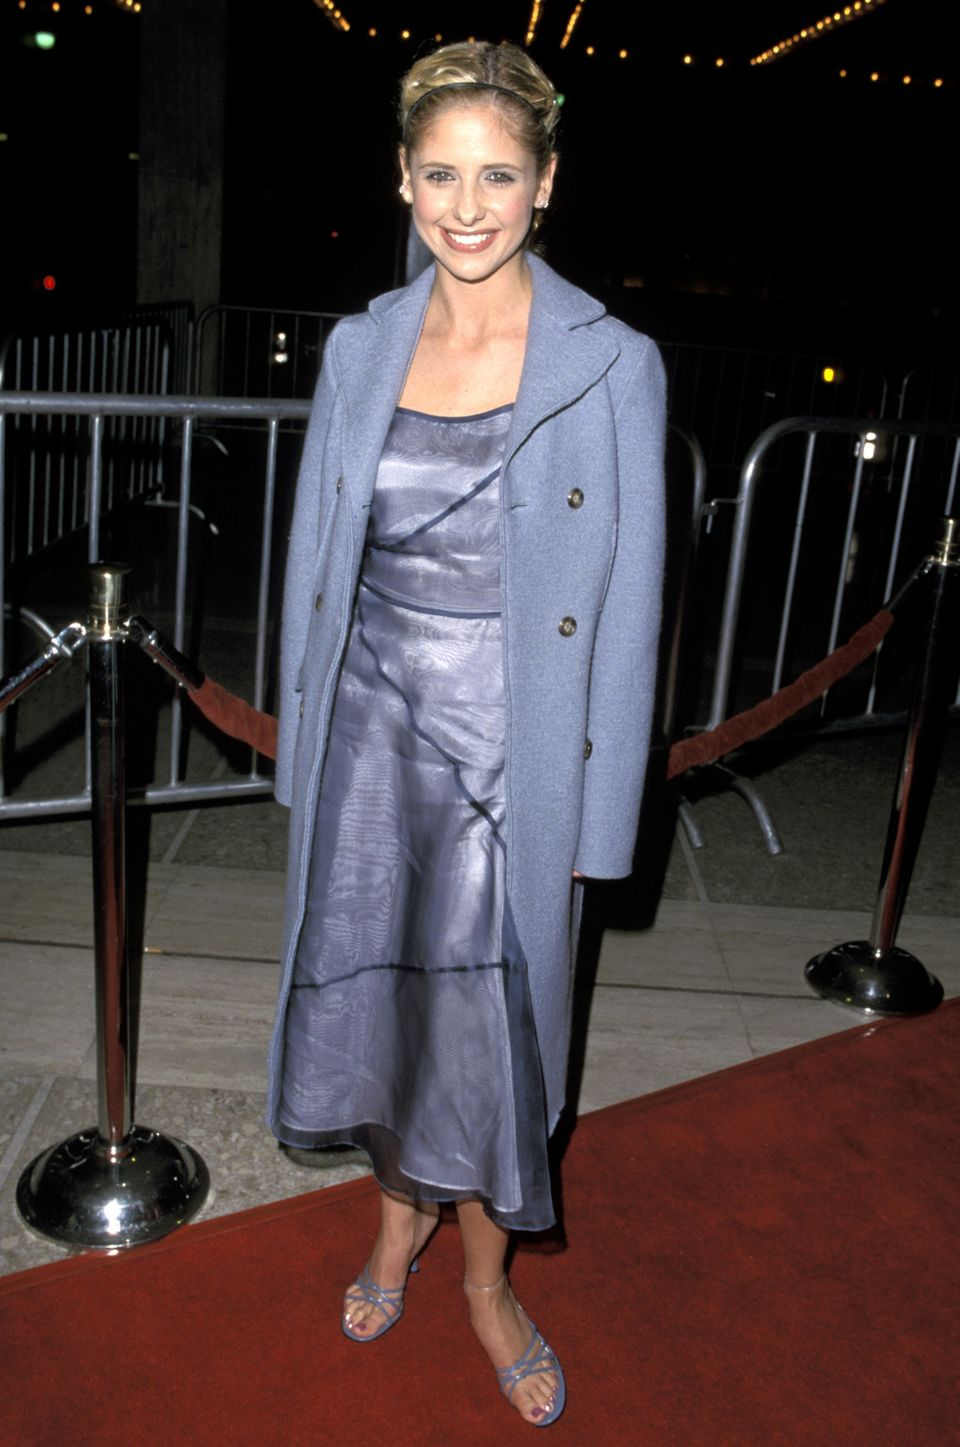 Sarah Michelle Gellar at the 1999 premiere of